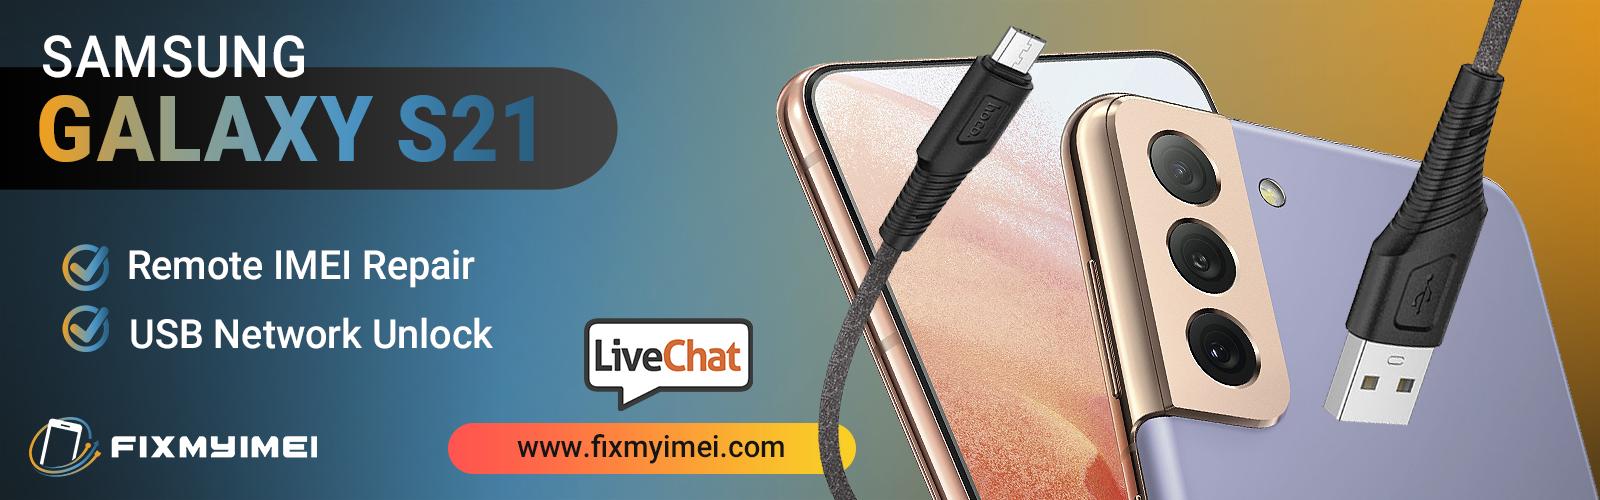 Samsung Galaxy s21 Series IMEI Repair & Network Unlock